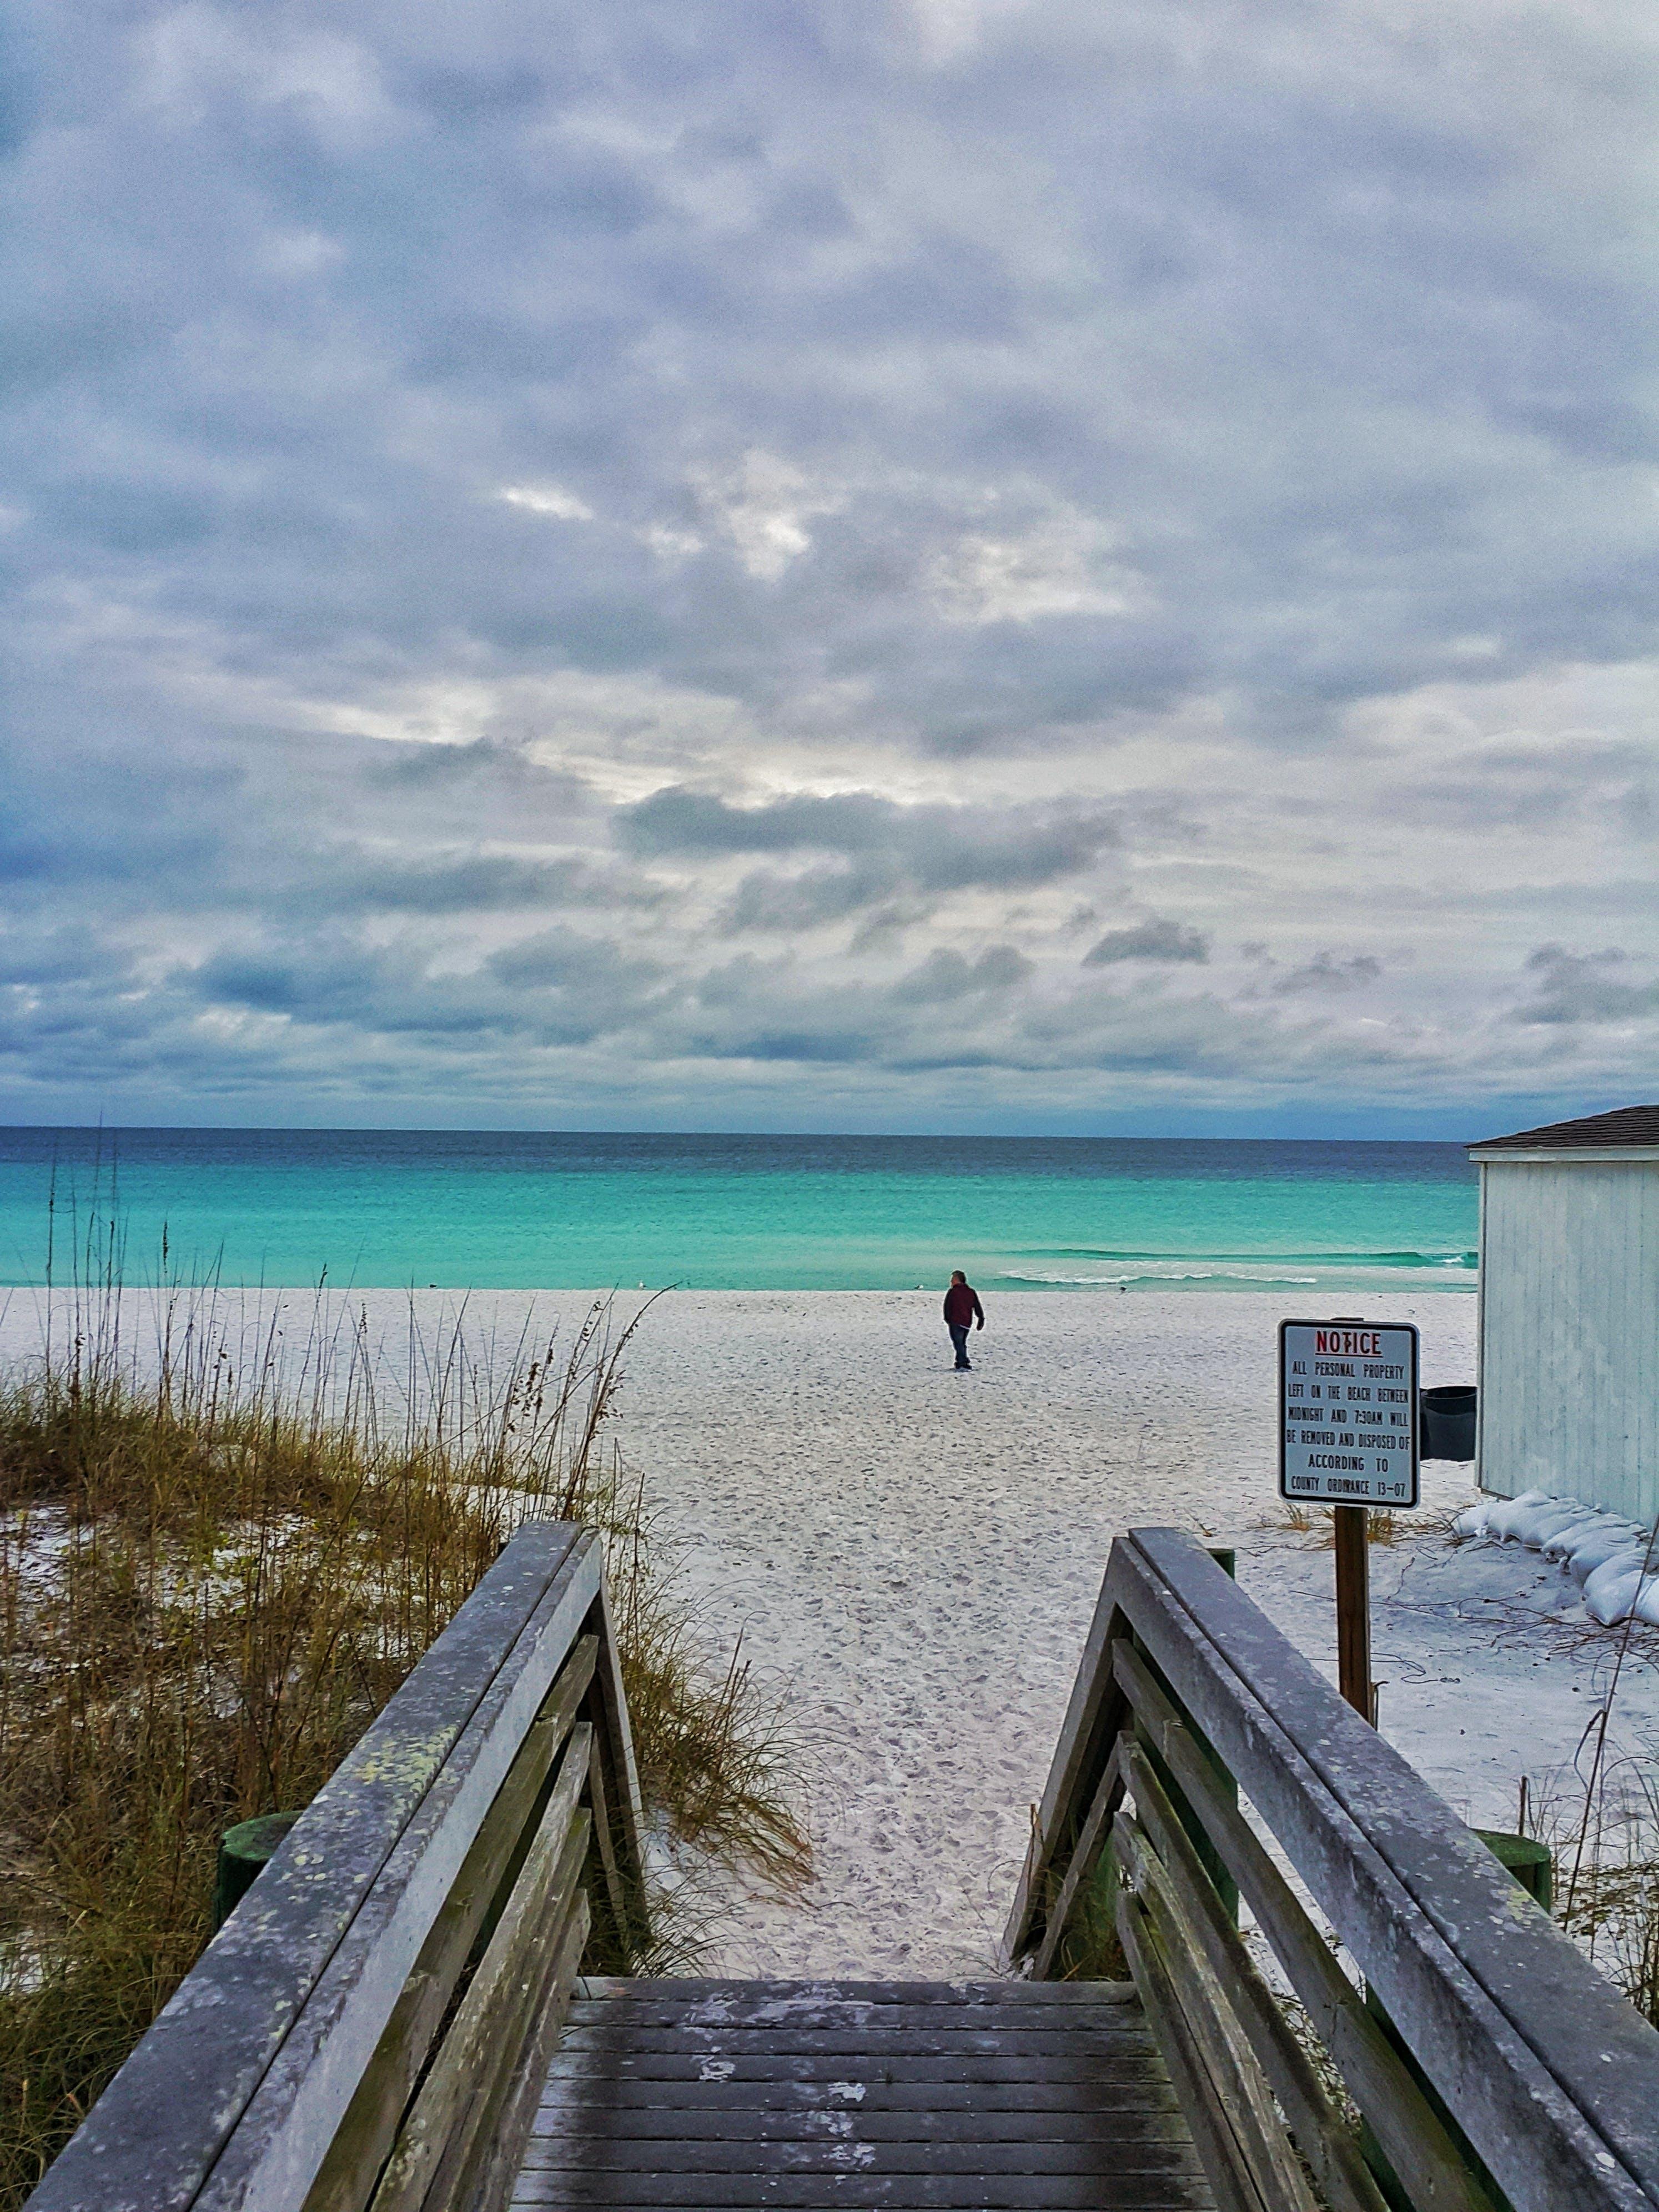 Free stock photo of beach, beach safety, florida, nature